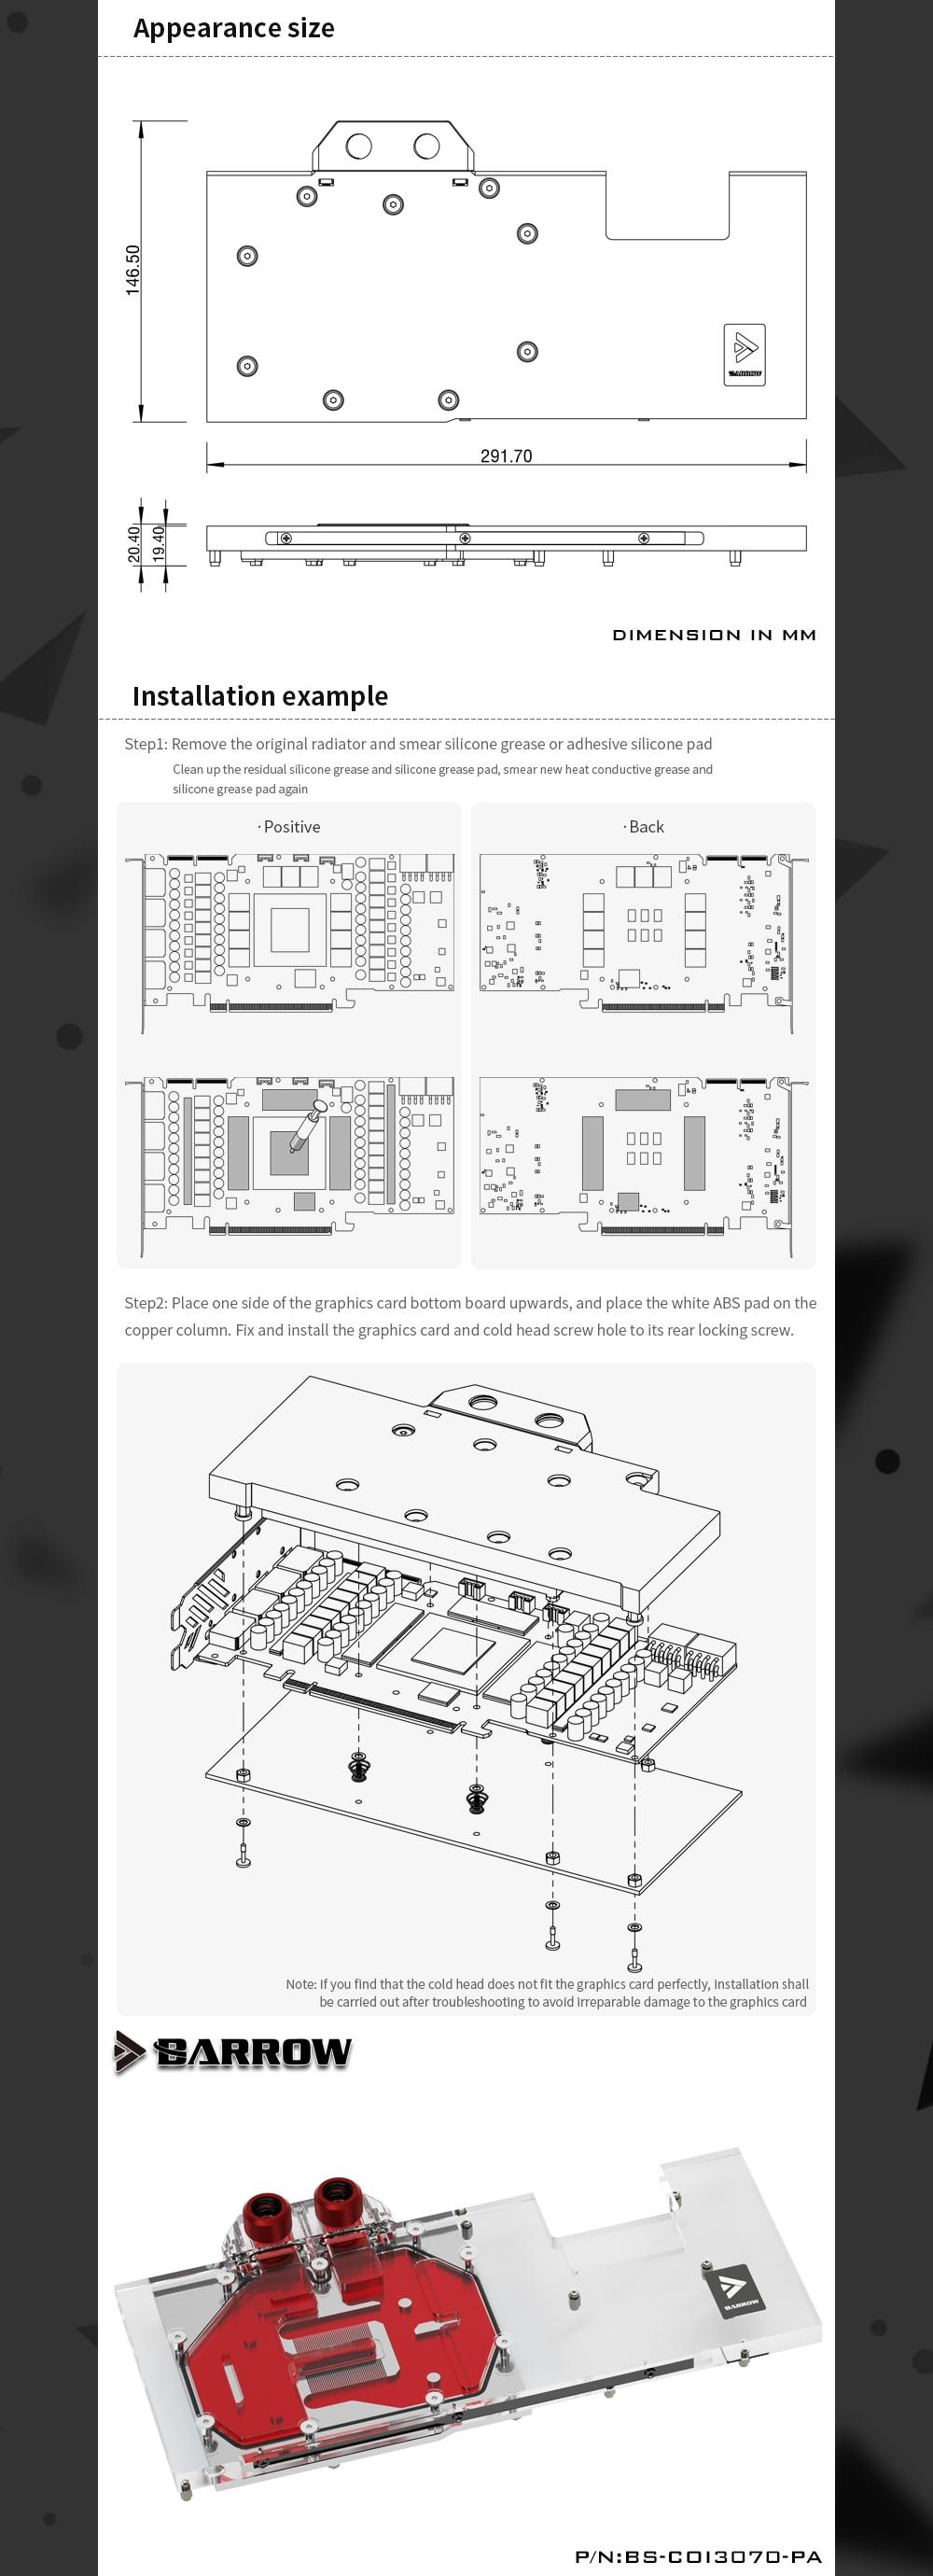 Barrow 3070 3060Ti GPU Water Block for Colorful RTX 3070 3060ti Vulcan, Full Cover 5v ARGB GPU Cooler, BS-COI3070-PA